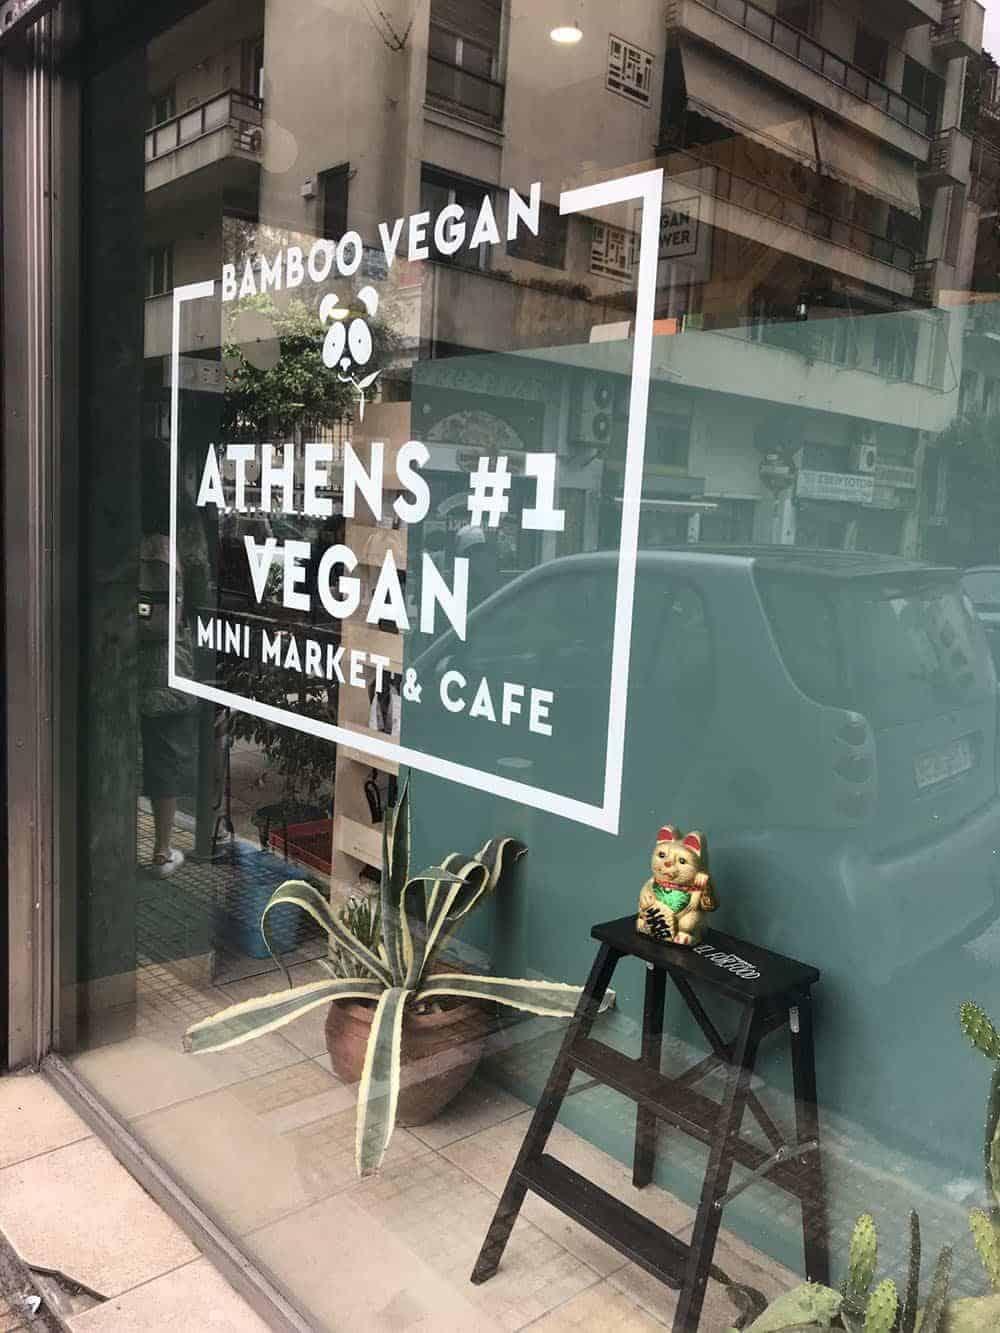 Bamboo vegan store, Athens